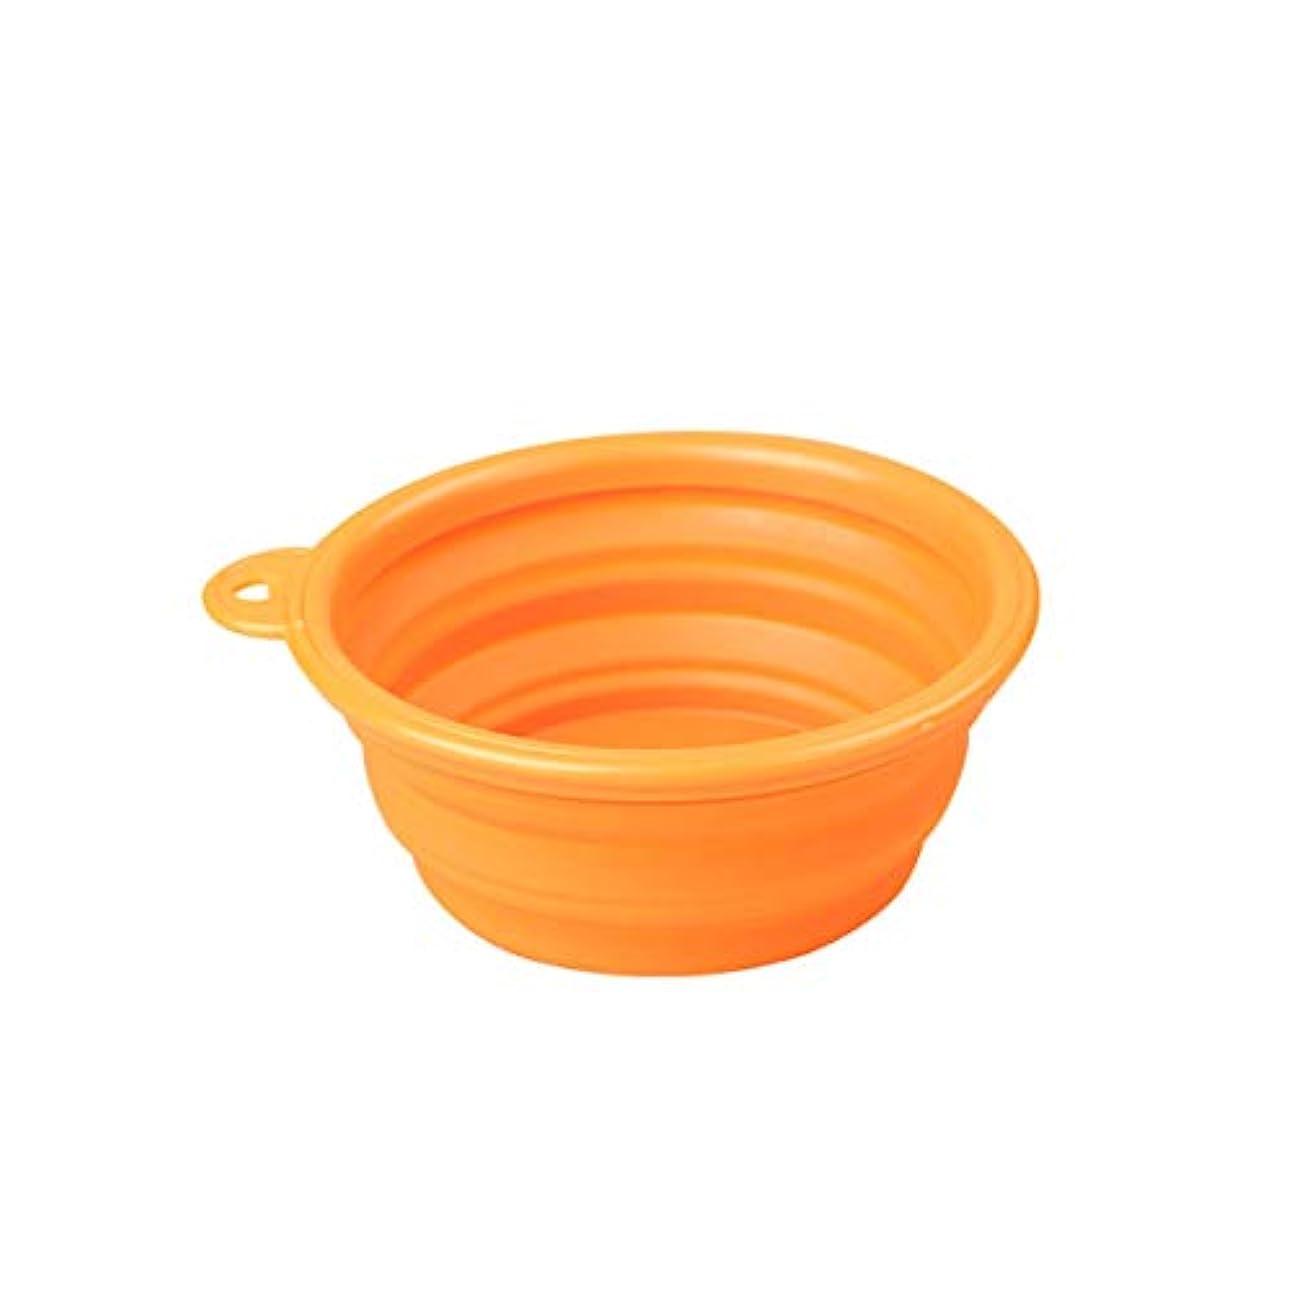 Xian ペットポータブル折りたたみボウル、犬のボウル、犬の猫、シリコンウォーターボウル、ペット用品、ランダムな色 Easy to Clean Non-Skid Bowls for Dogs (Color : Random)